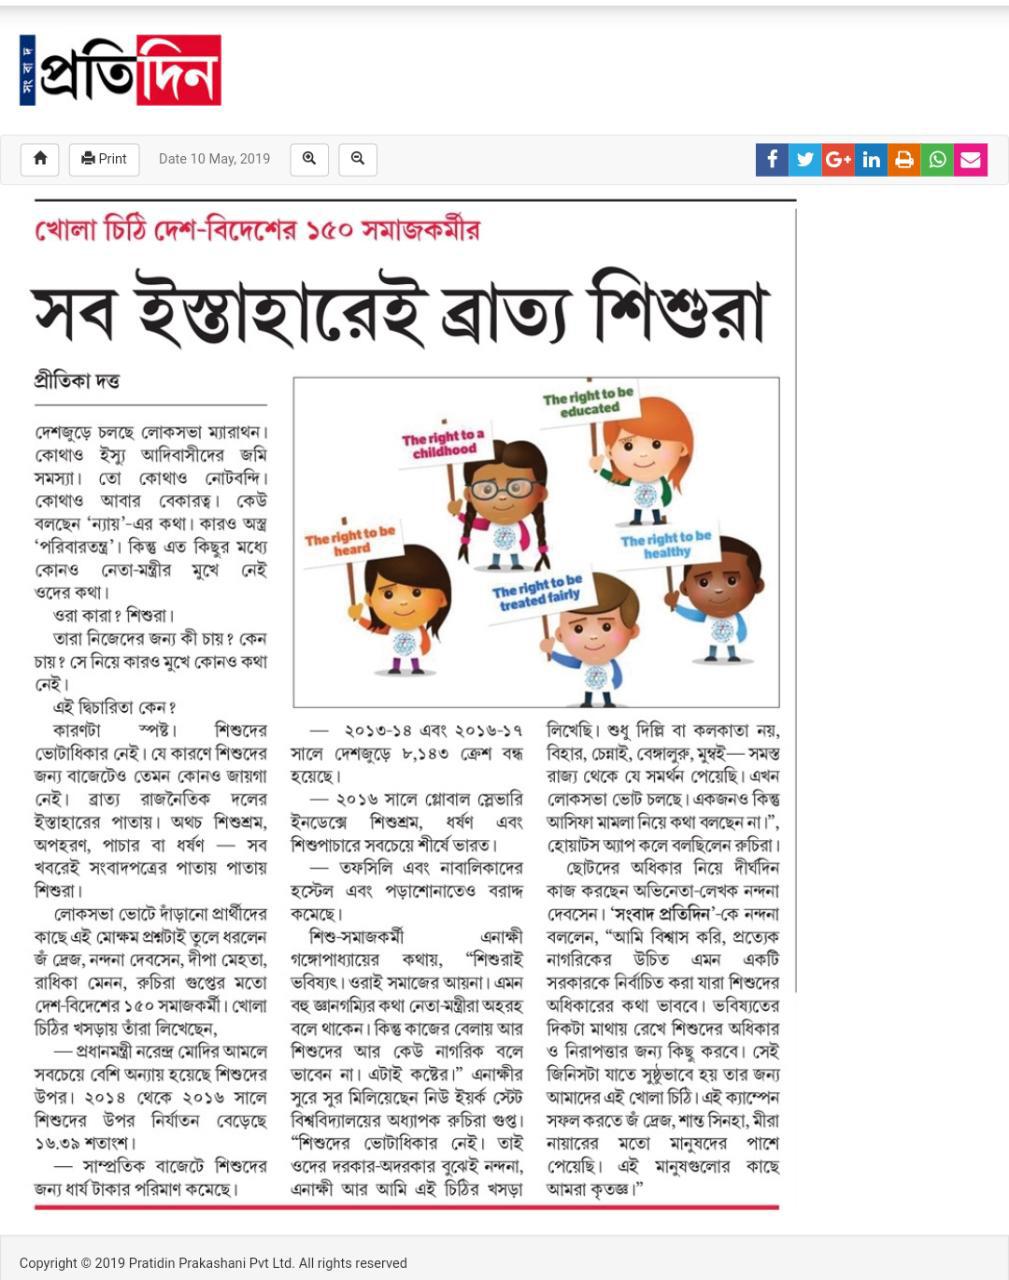 Pratidin Prakashani -  click here for full article (external website)   May 10, 2019